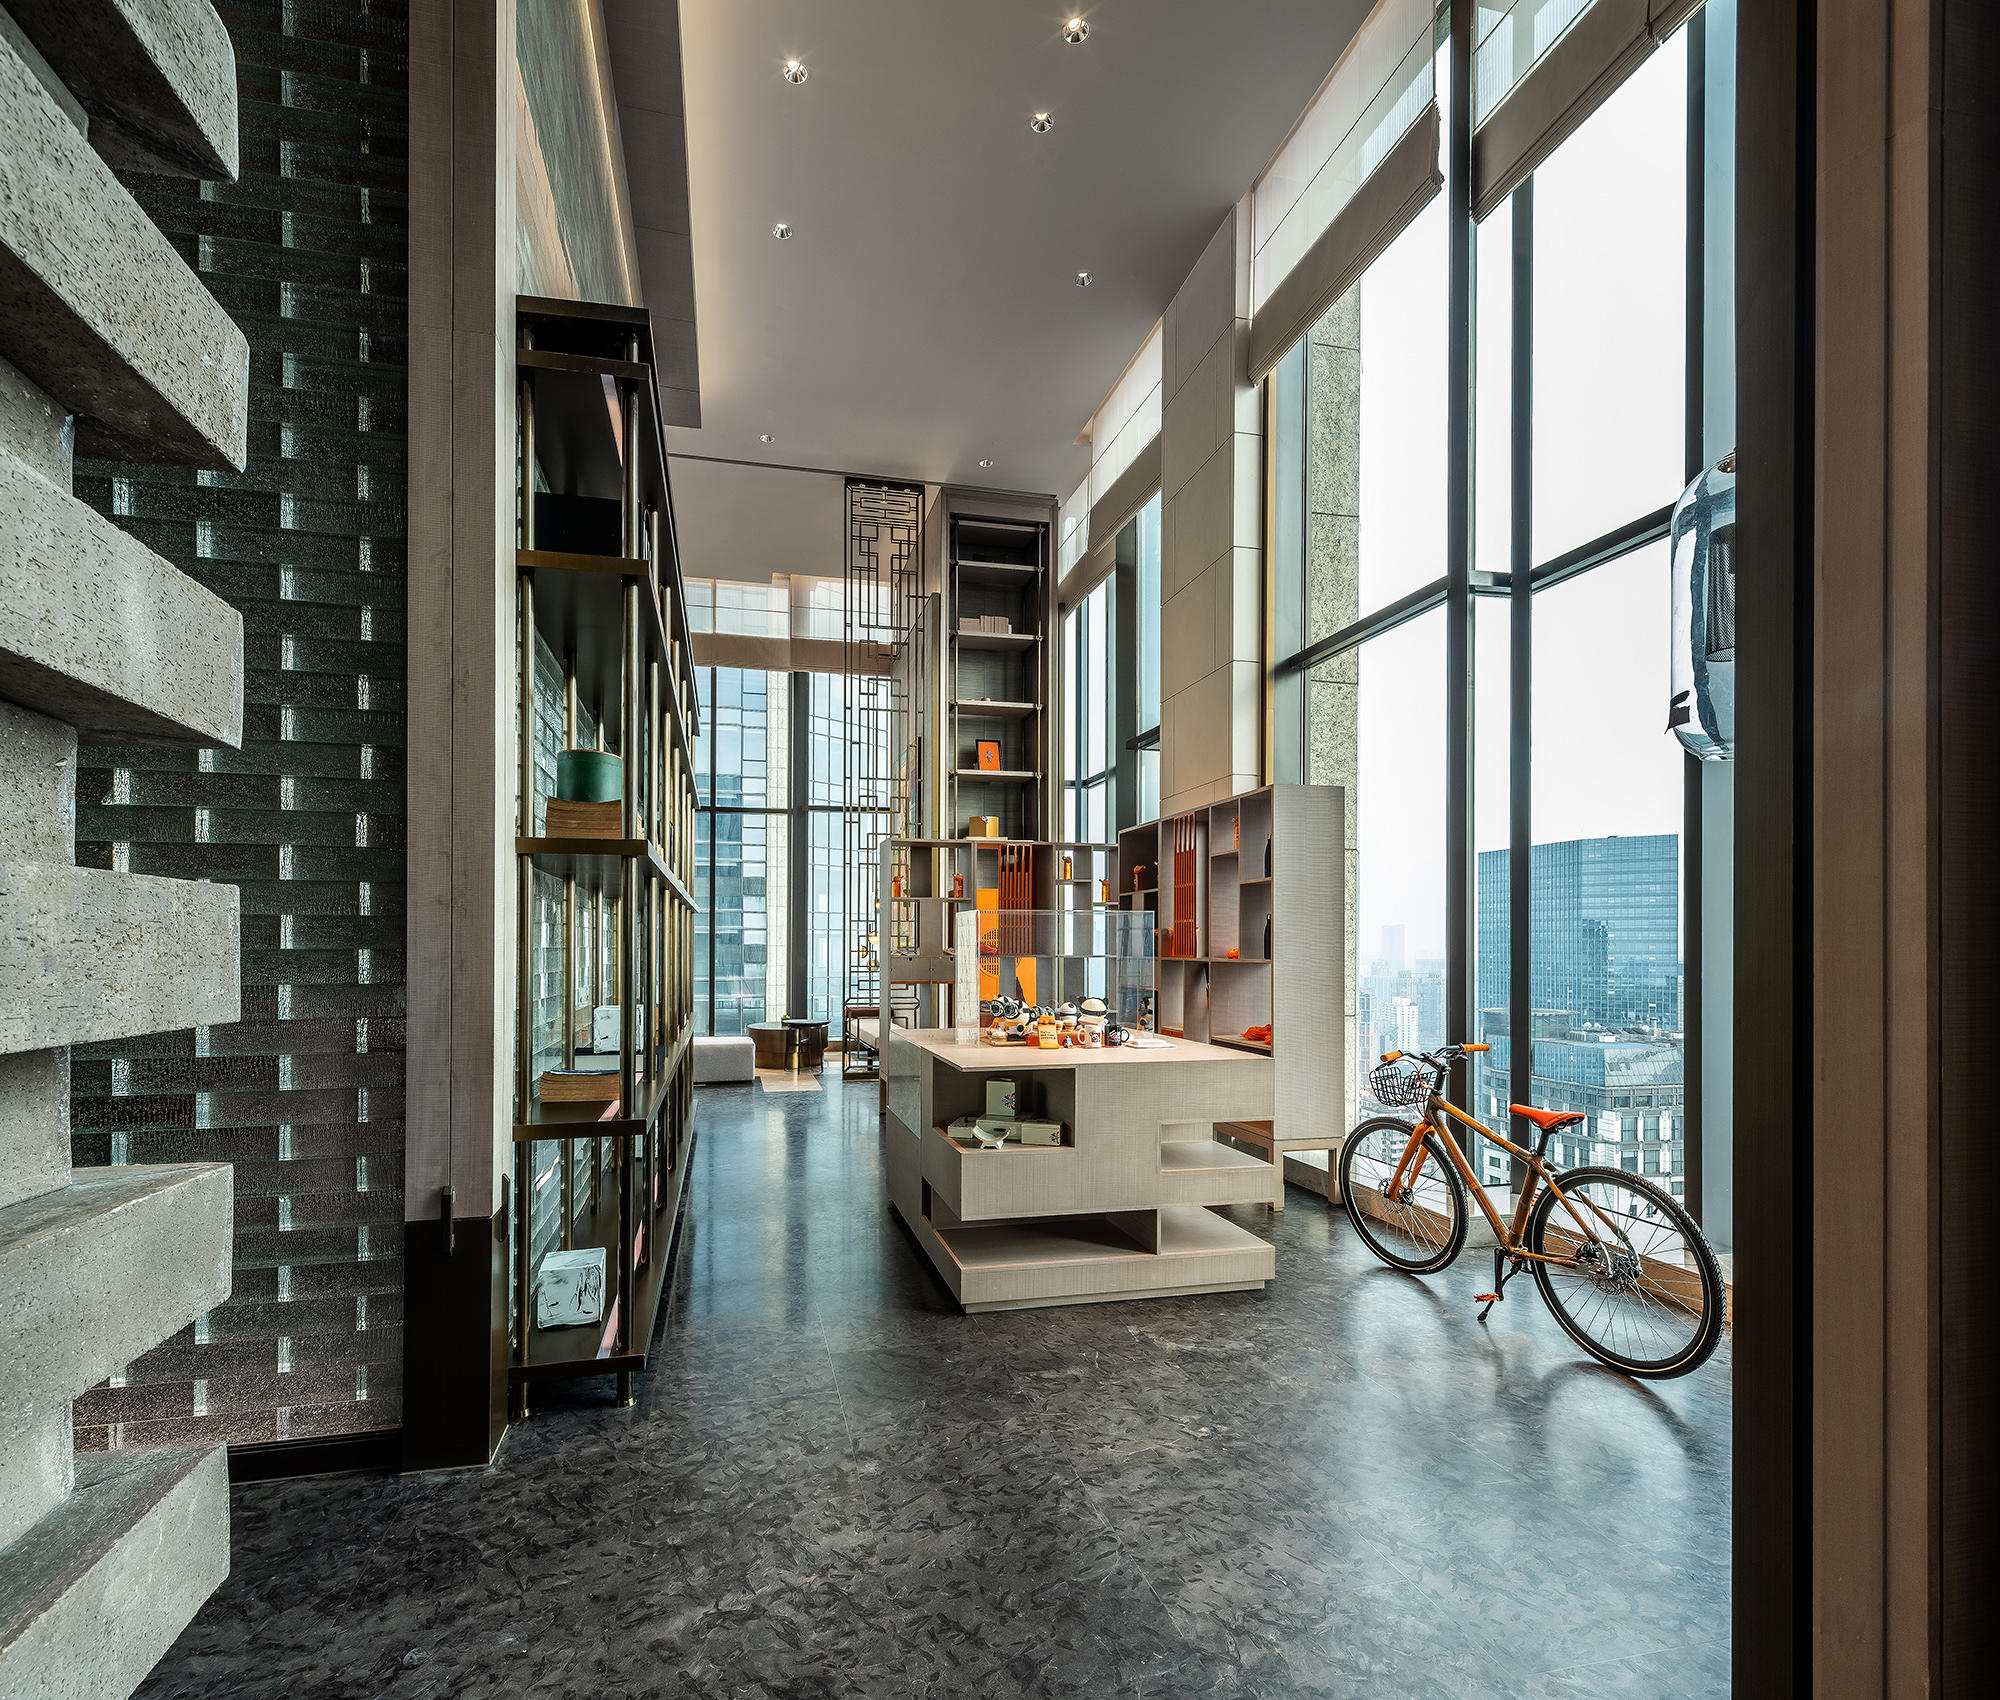 Canopy By Hilton In Chengdu De Ccd Cheng Chung Design Interieurs D Hotel